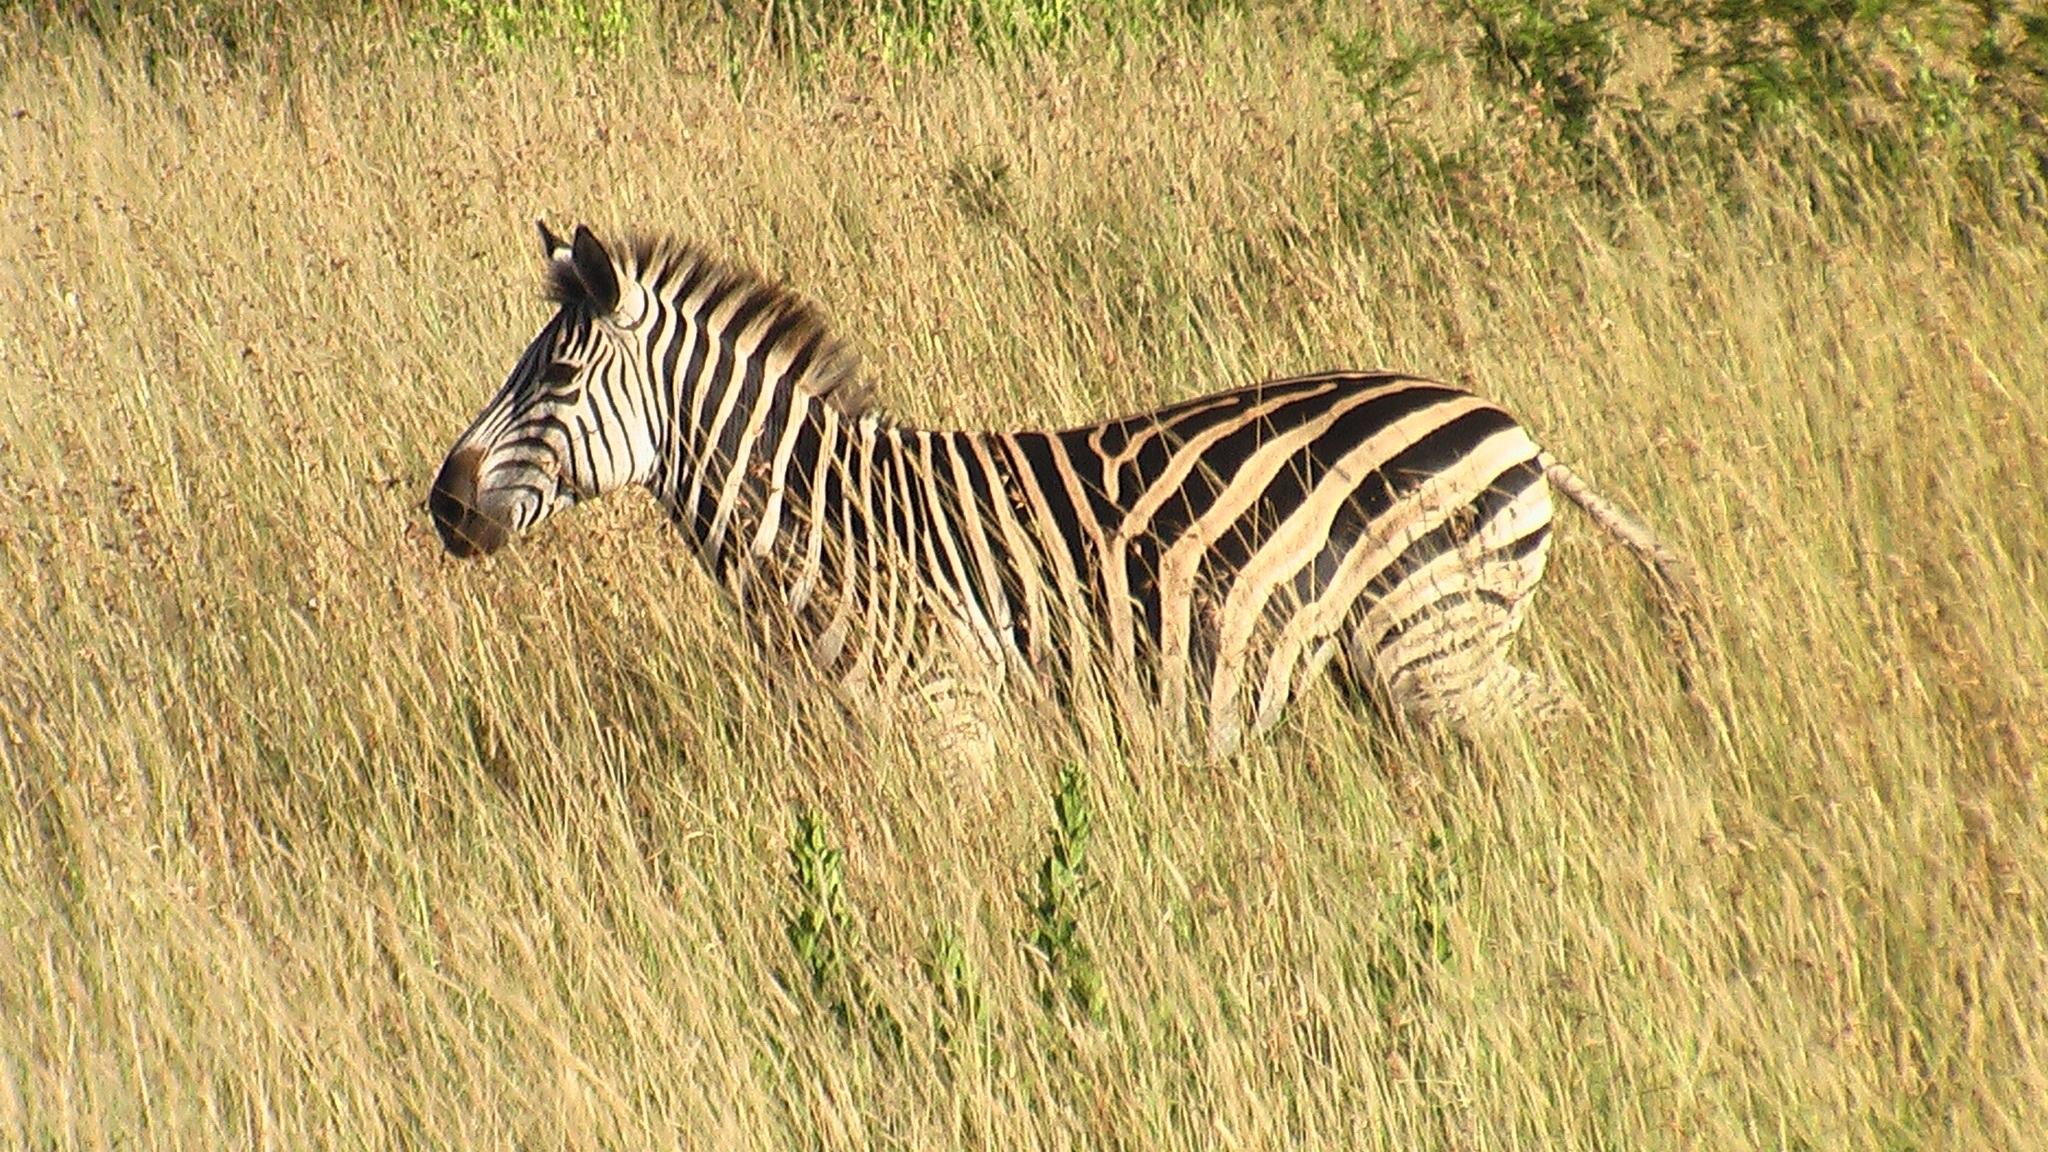 zebra wildlife south africa - HD2048×1152